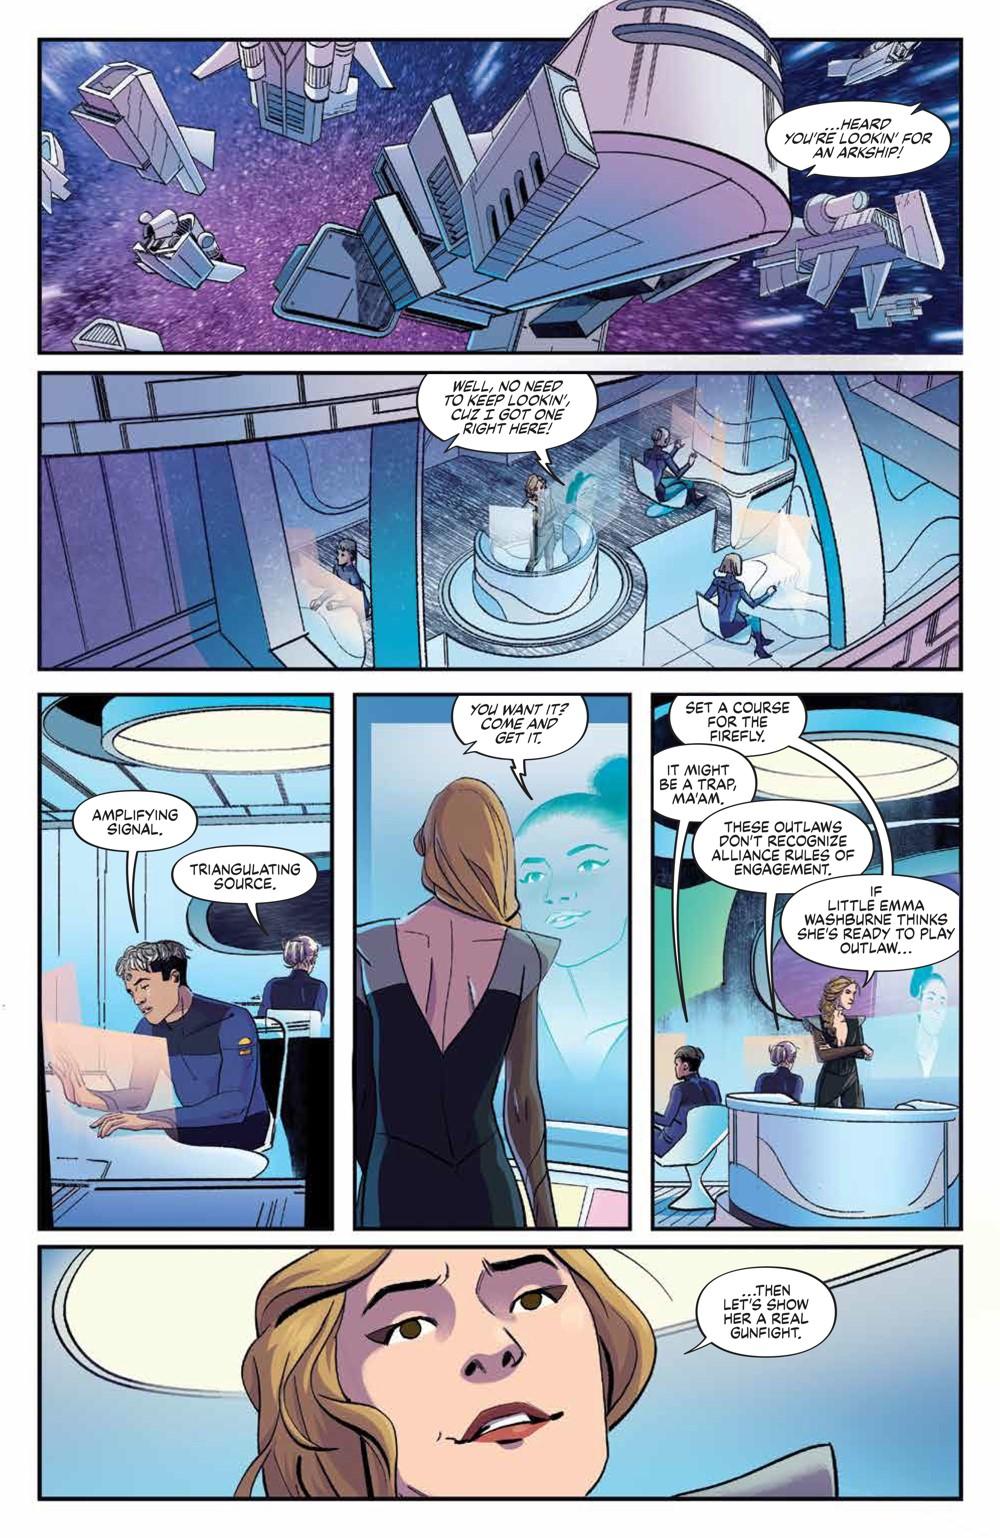 Firefly_BrandNewVerse_006_PRESS_6 ComicList Previews: FIREFLY BRAND NEW 'VERSE #6 (OF 6)